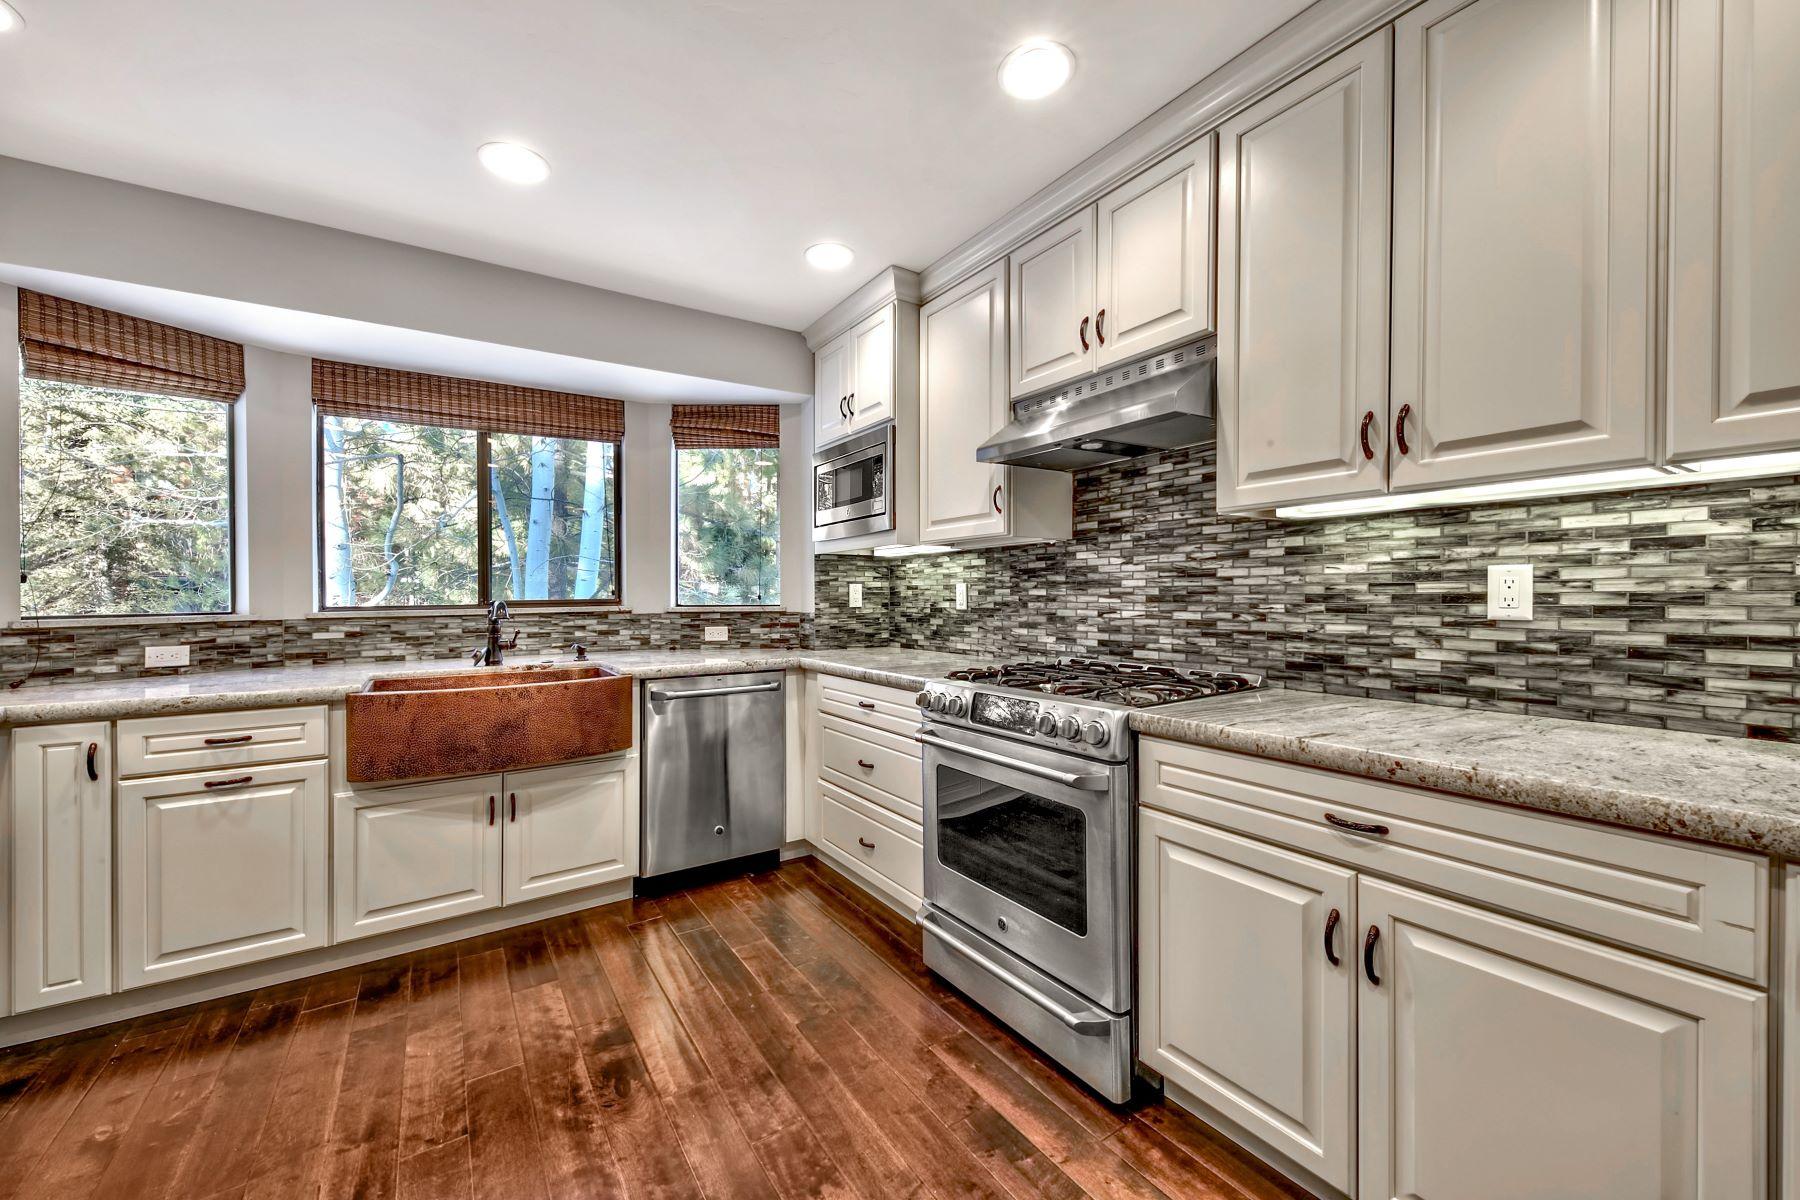 Additional photo for property listing at 171 Village Blvd. #6 Incline Village, NV 89451 171 Village Boulevard #6 Incline Village, 内华达州 89451 美国